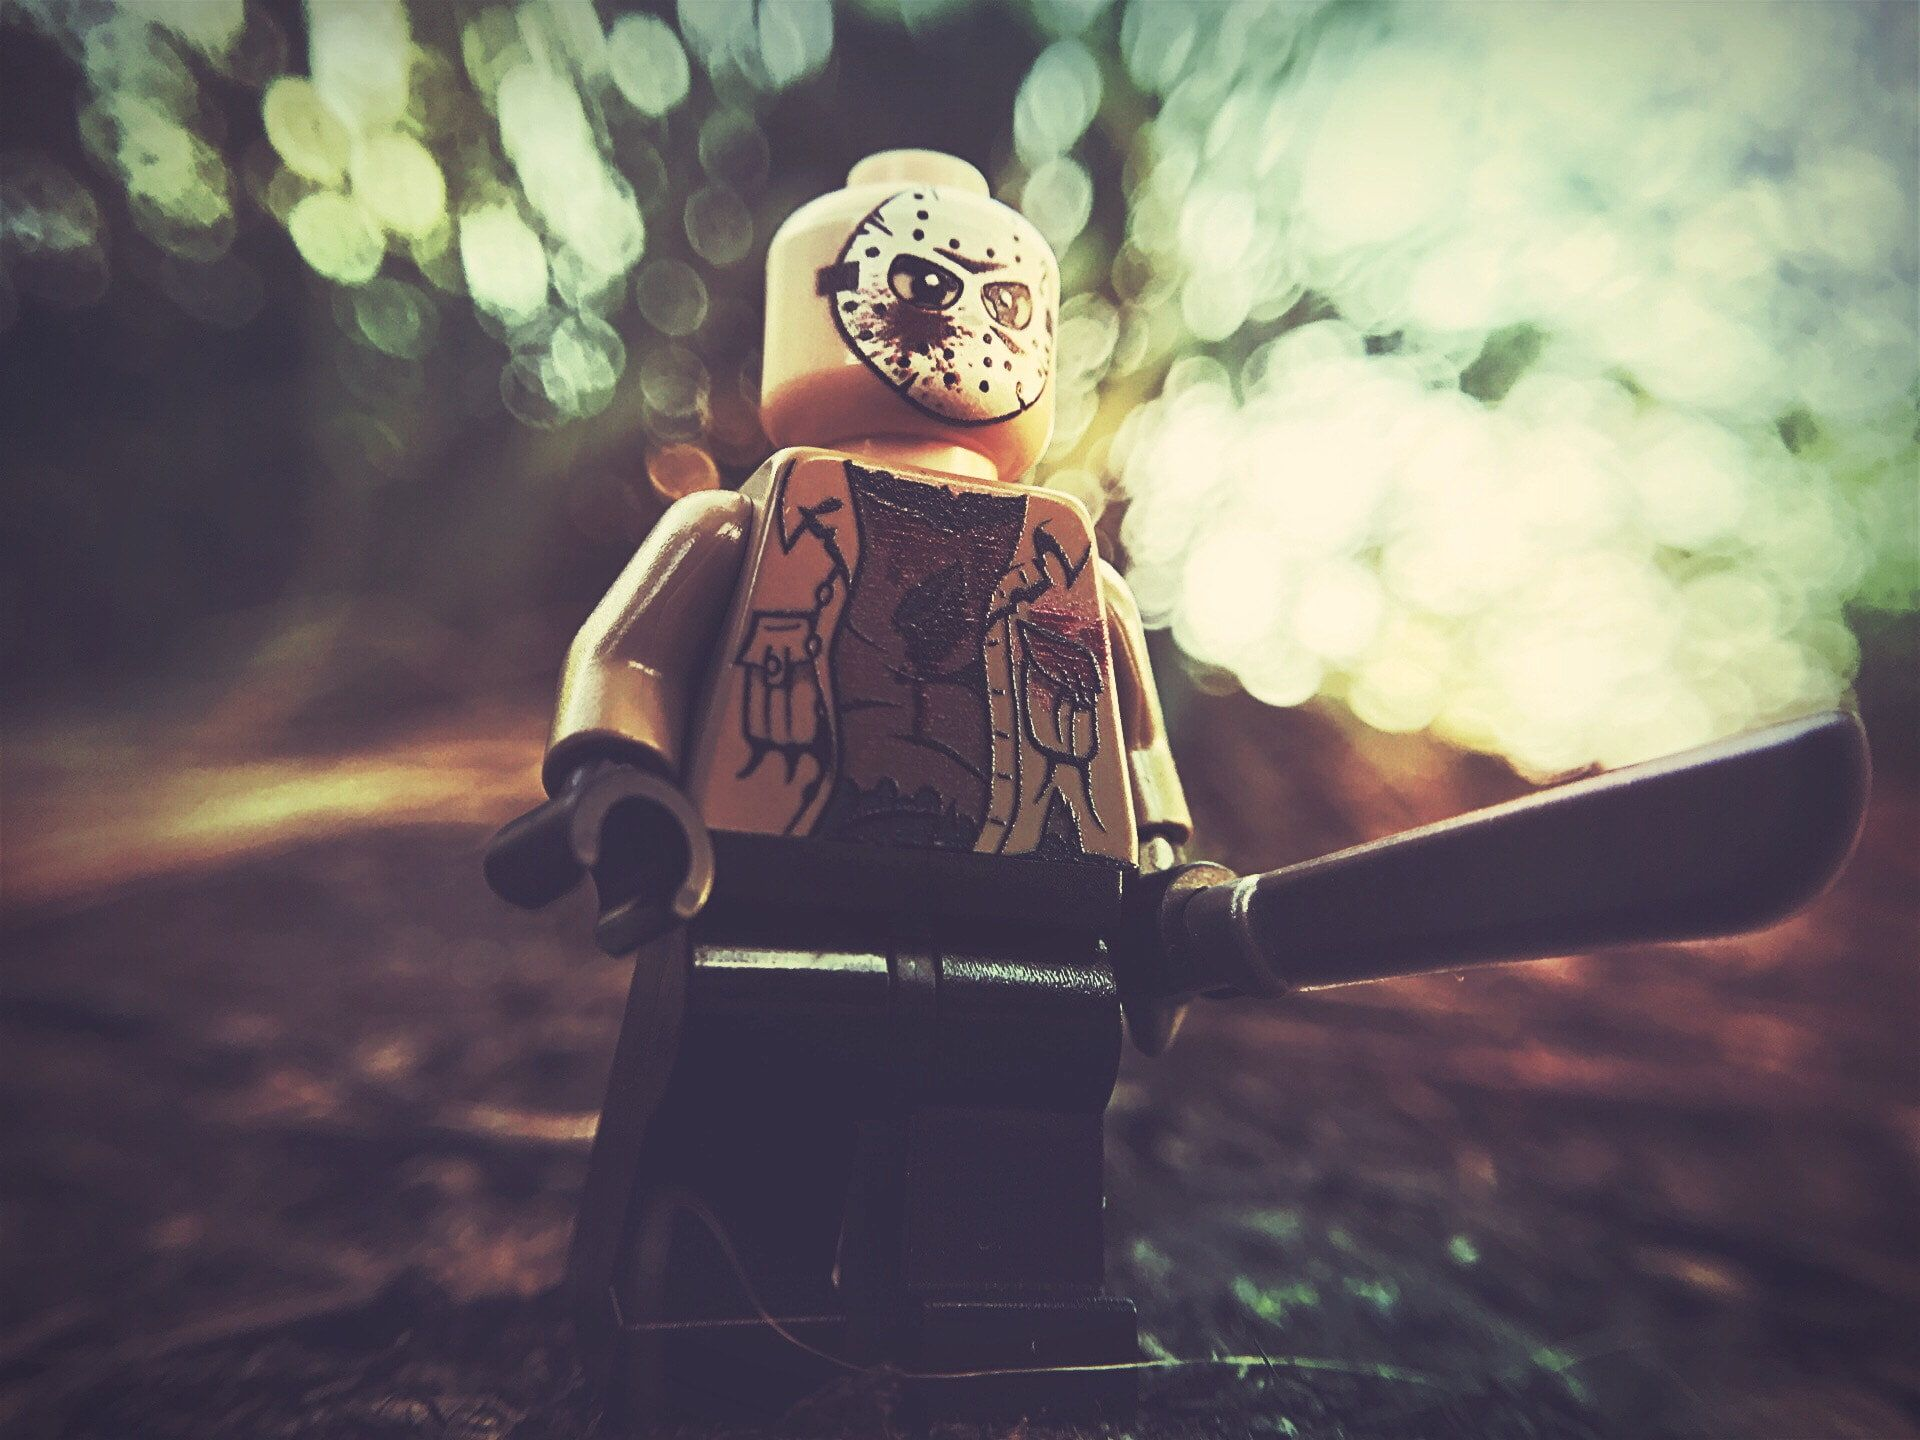 Horror Jason Voorhees Lego Toys 1080p Wallpaper Hdwallpaper Desktop Lego Stormtrooper Stormtrooper Toy Horror Desktop jason voorhees wallpaper hd